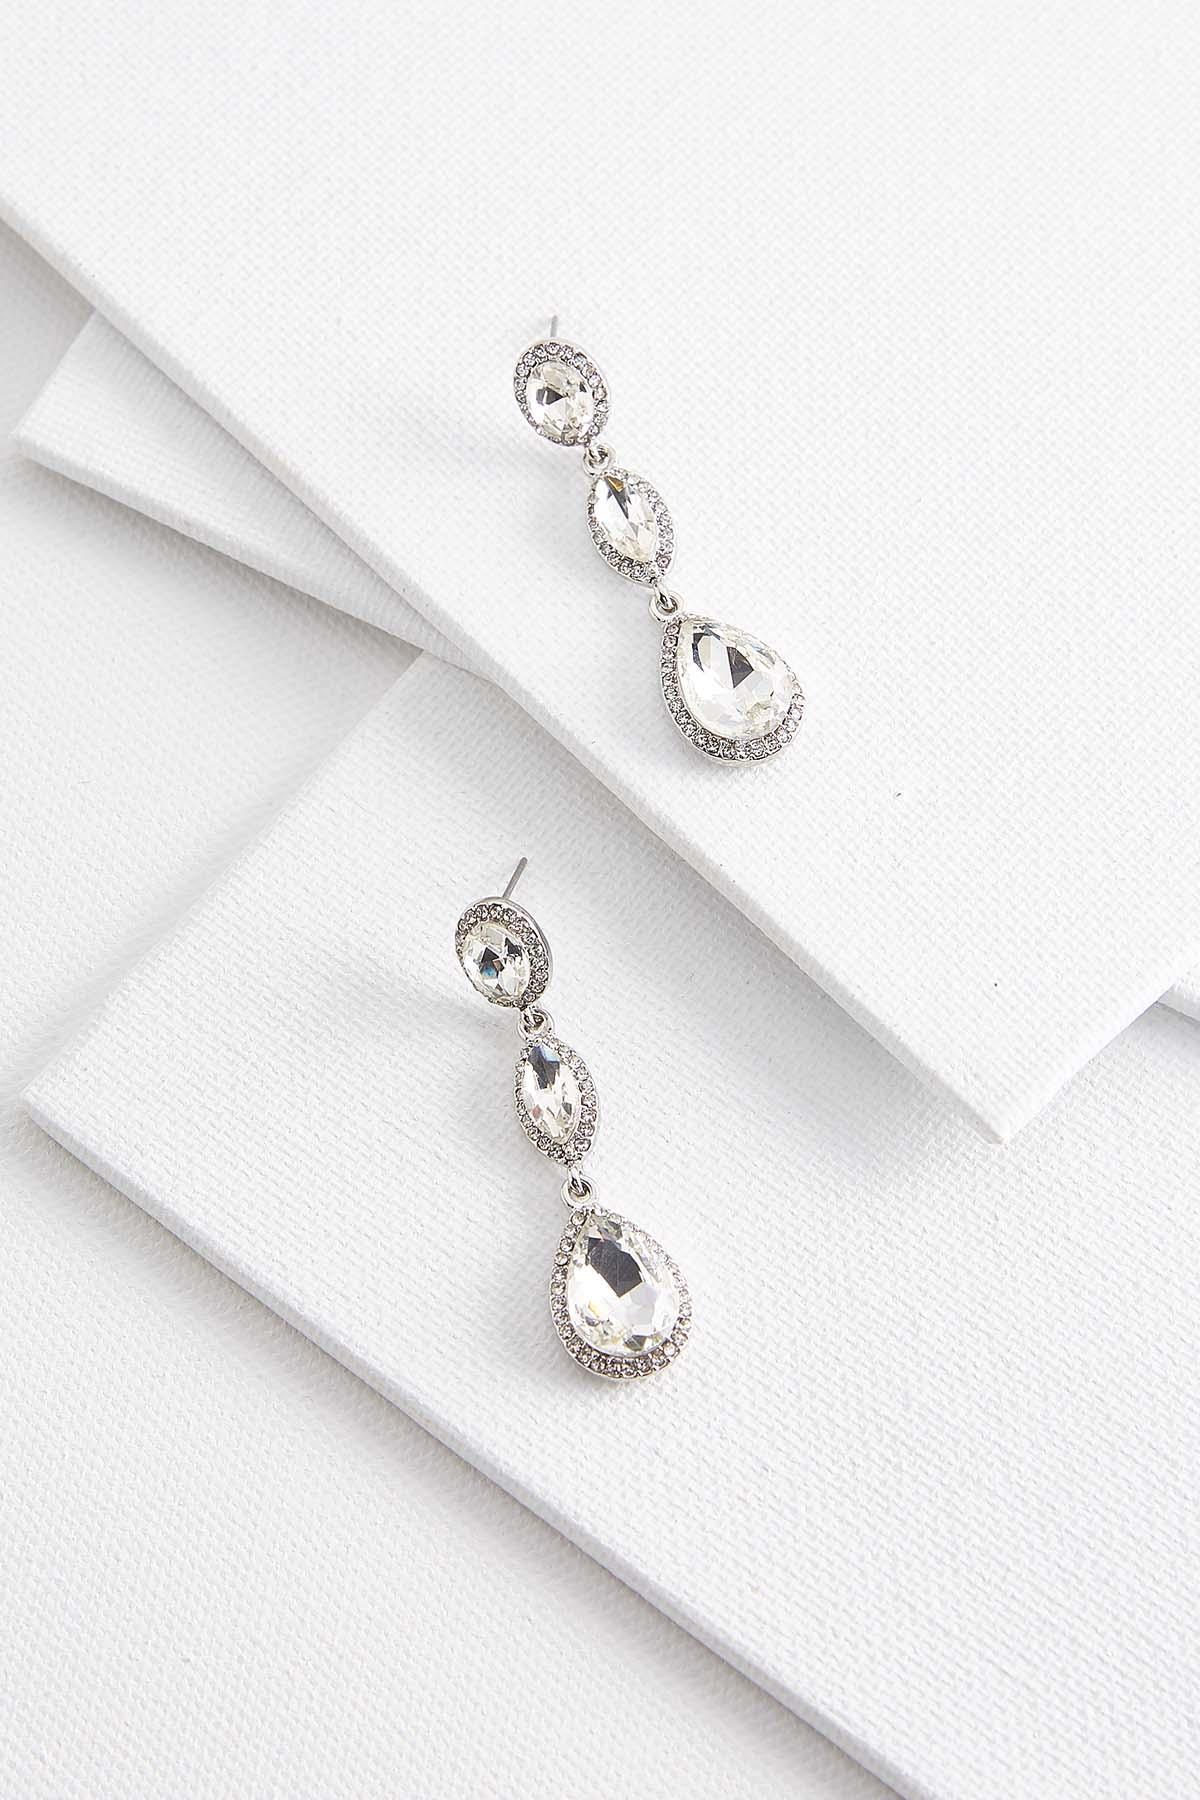 Haloed Stone Statement Earrings